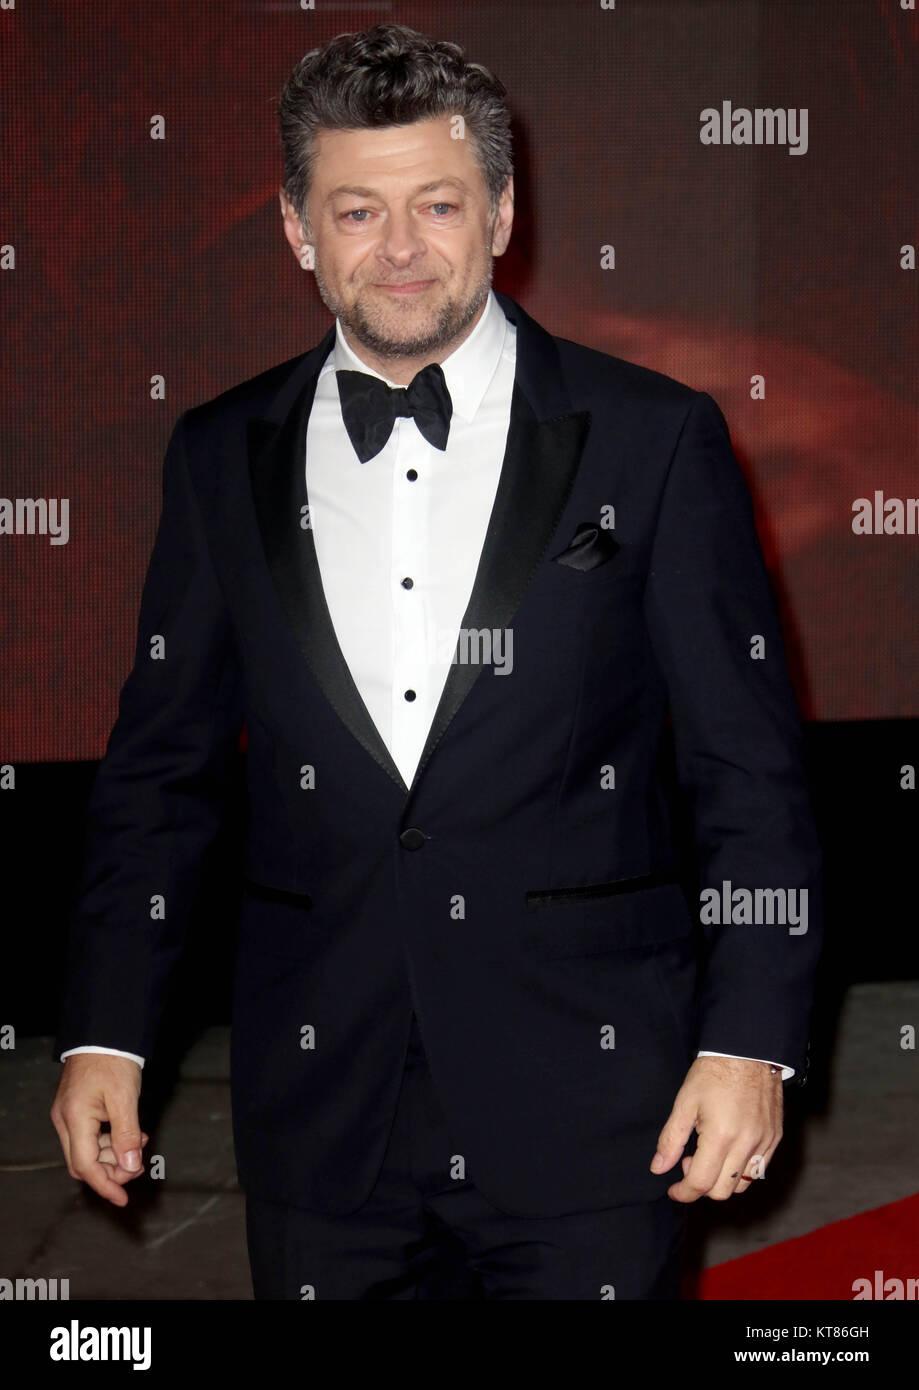 Dec 12, 2017 - Andy Serkis attending 'Star Wars: The Last Jedi' European Premiere at Royal Albert Hall  - Stock Image